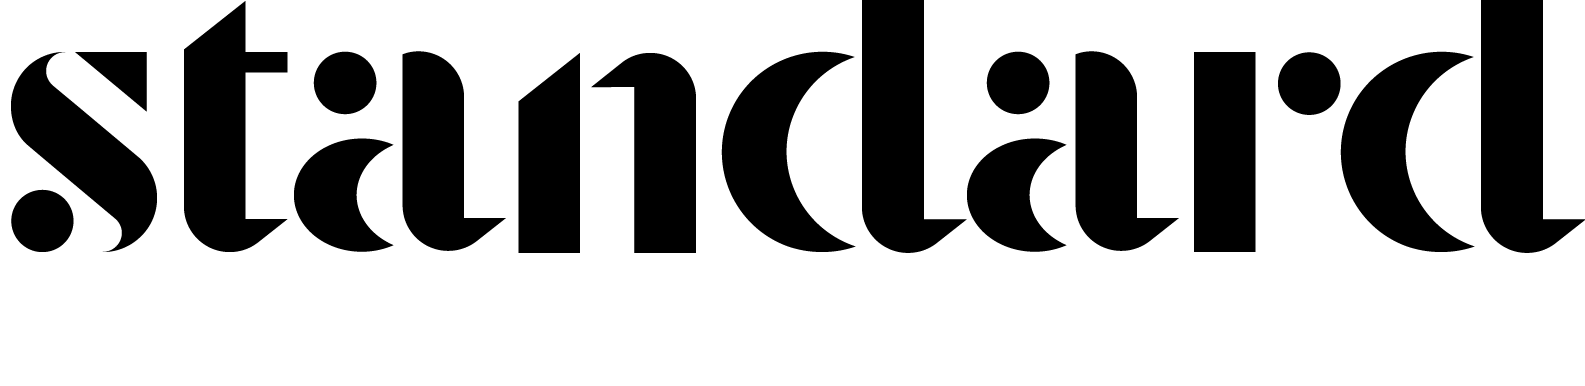 Standard logo full word.PNG